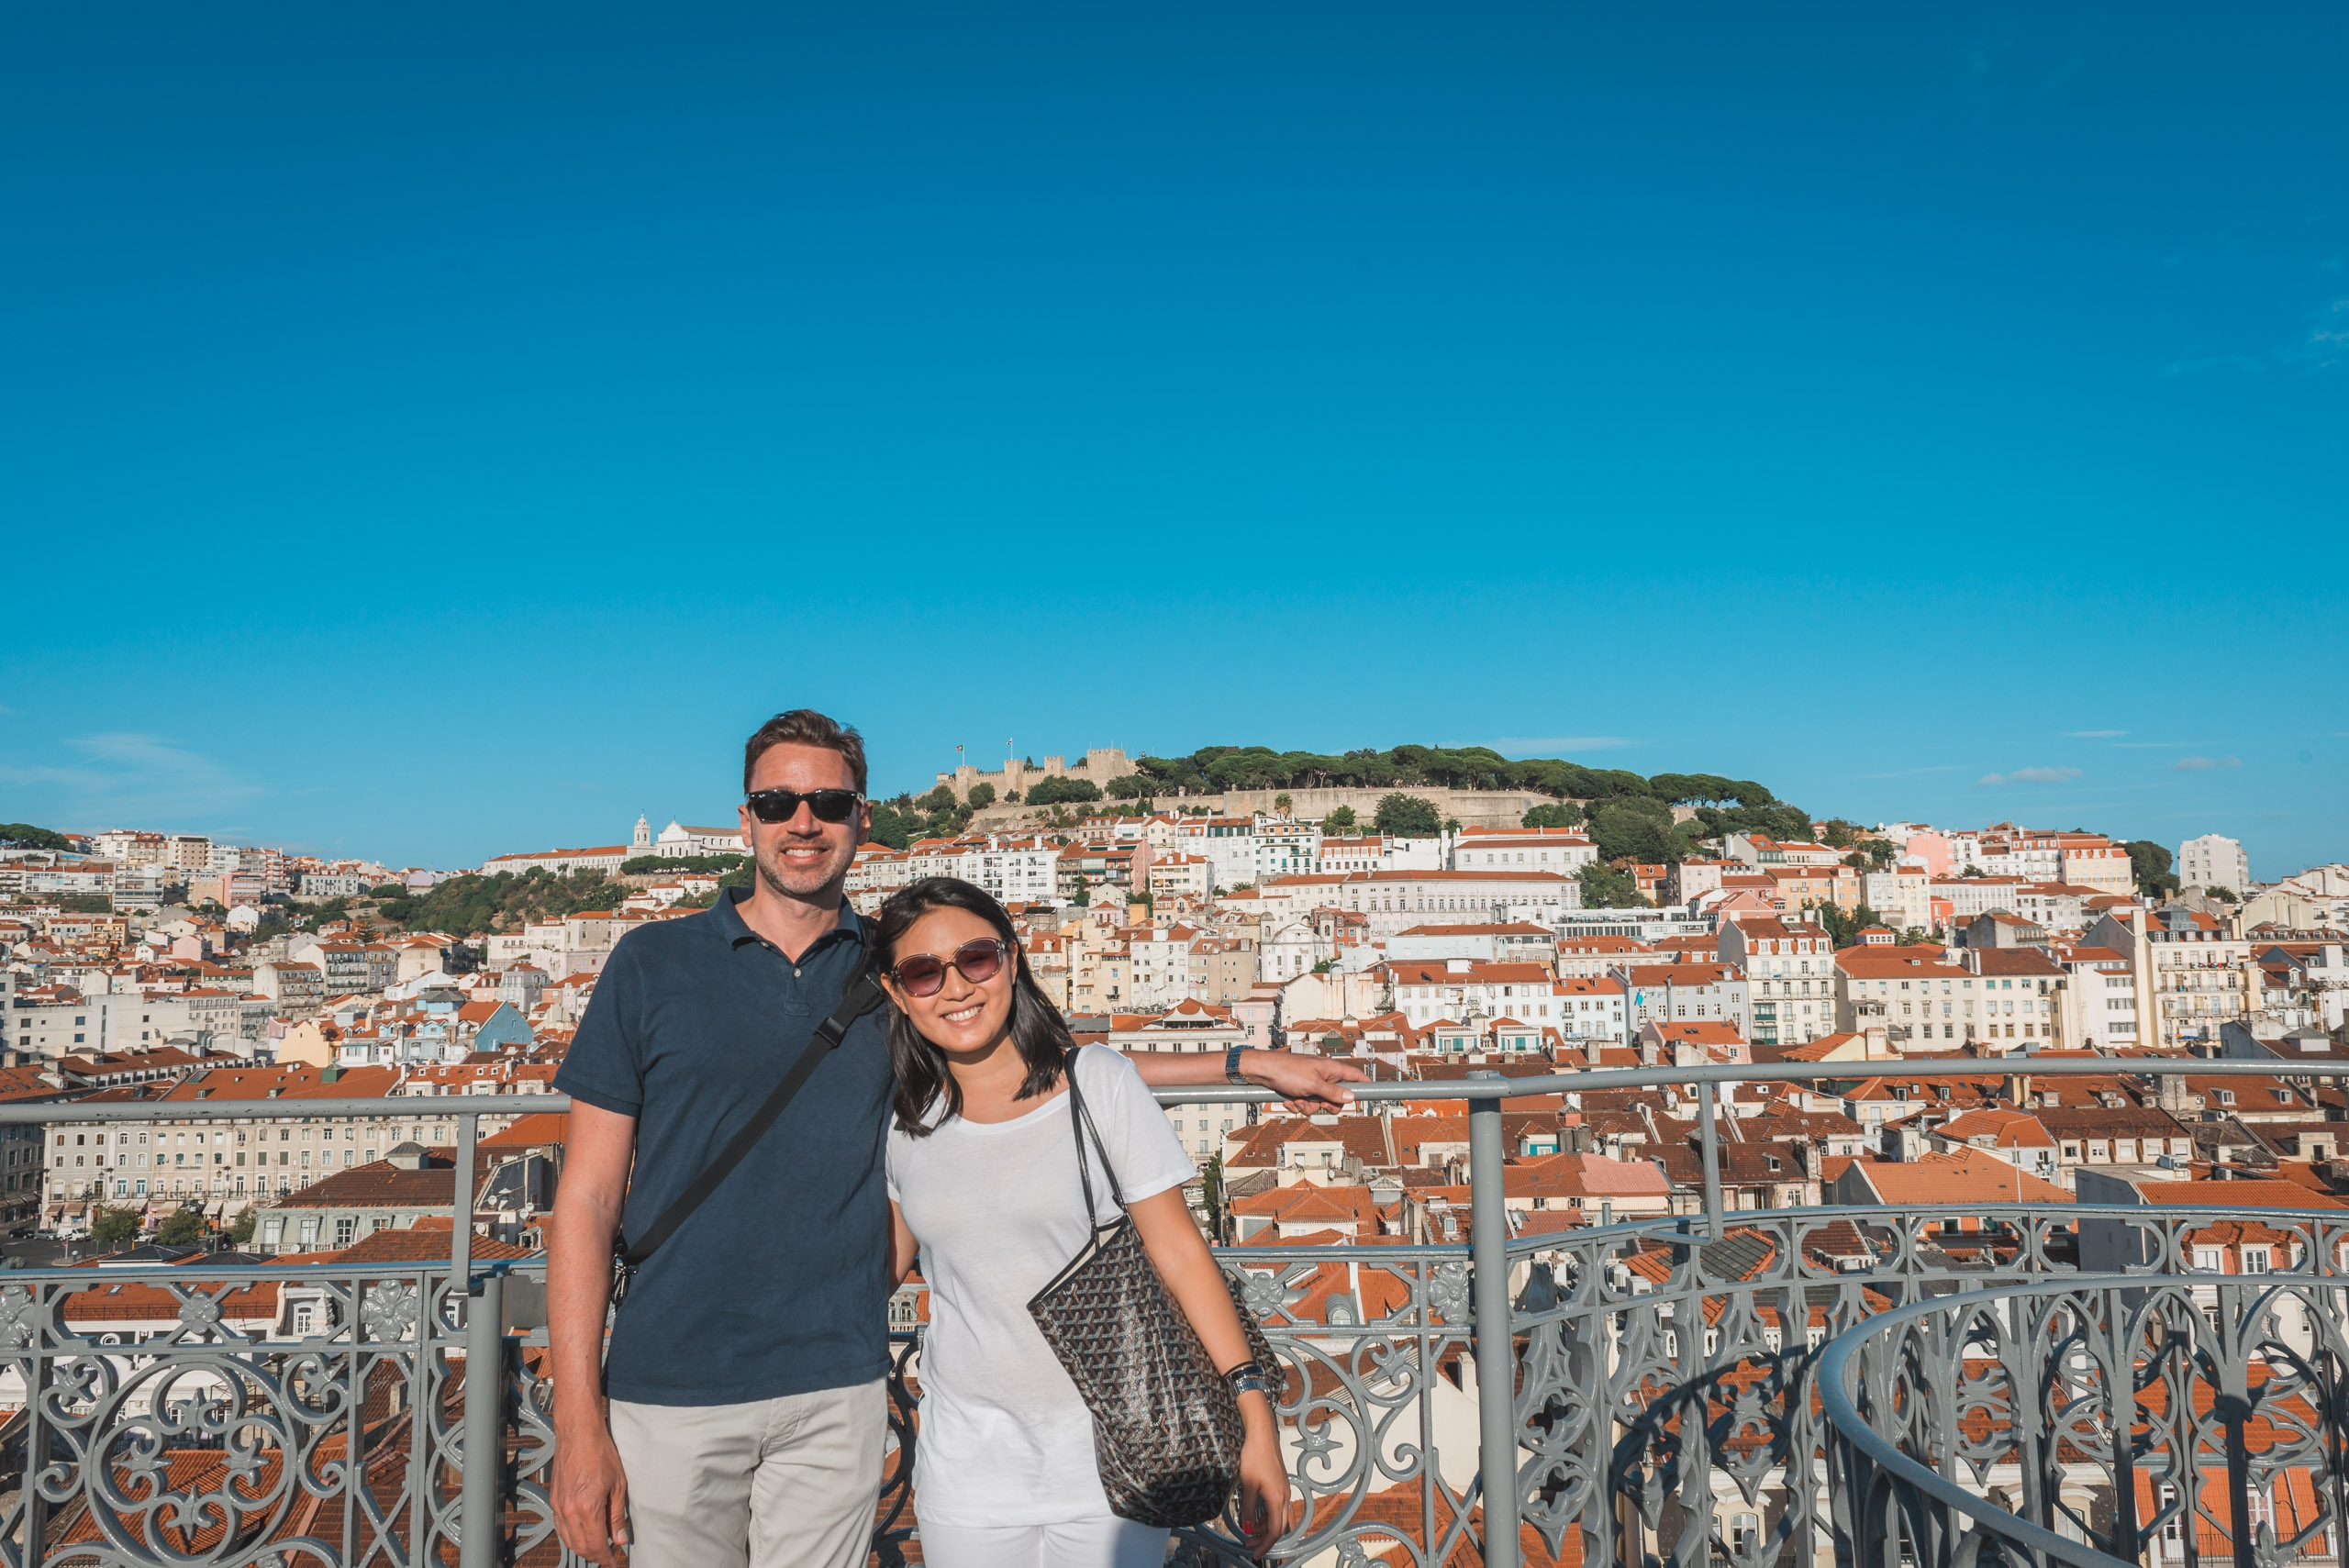 Portugal - Lisbon - 2012-0922-DSC_1453_33793